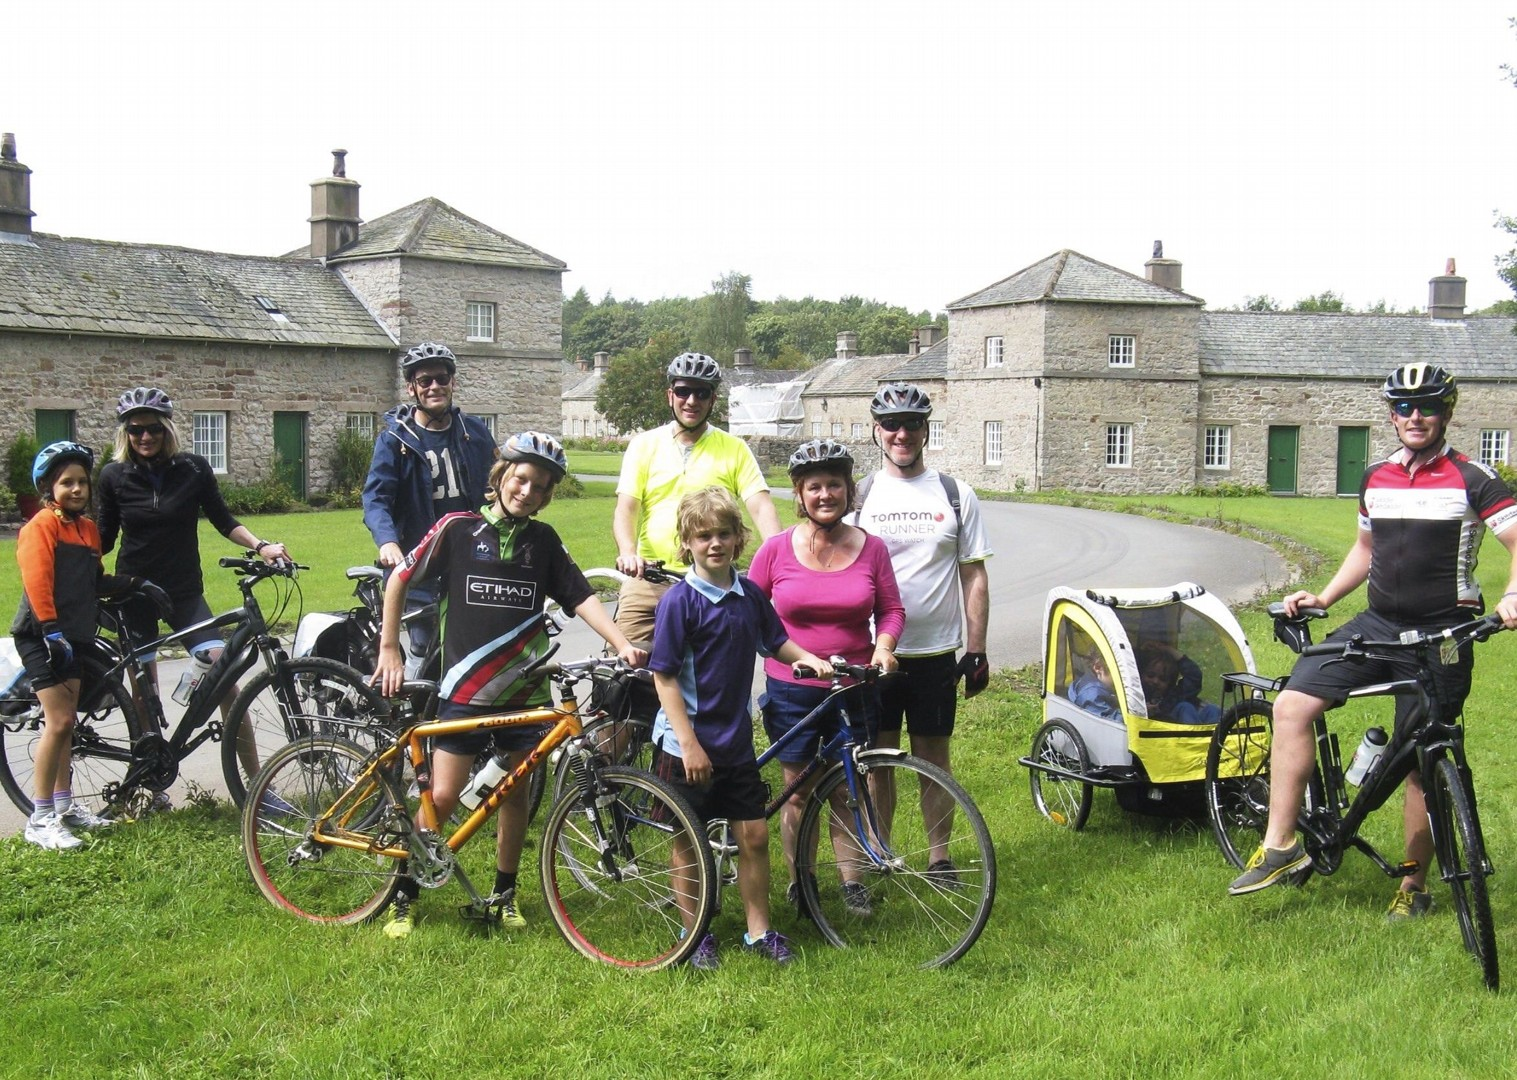 guided-group-family-bike-skills-uk.jpg - UK - Lake District - Guided Family Bike Skills - Family Cycling